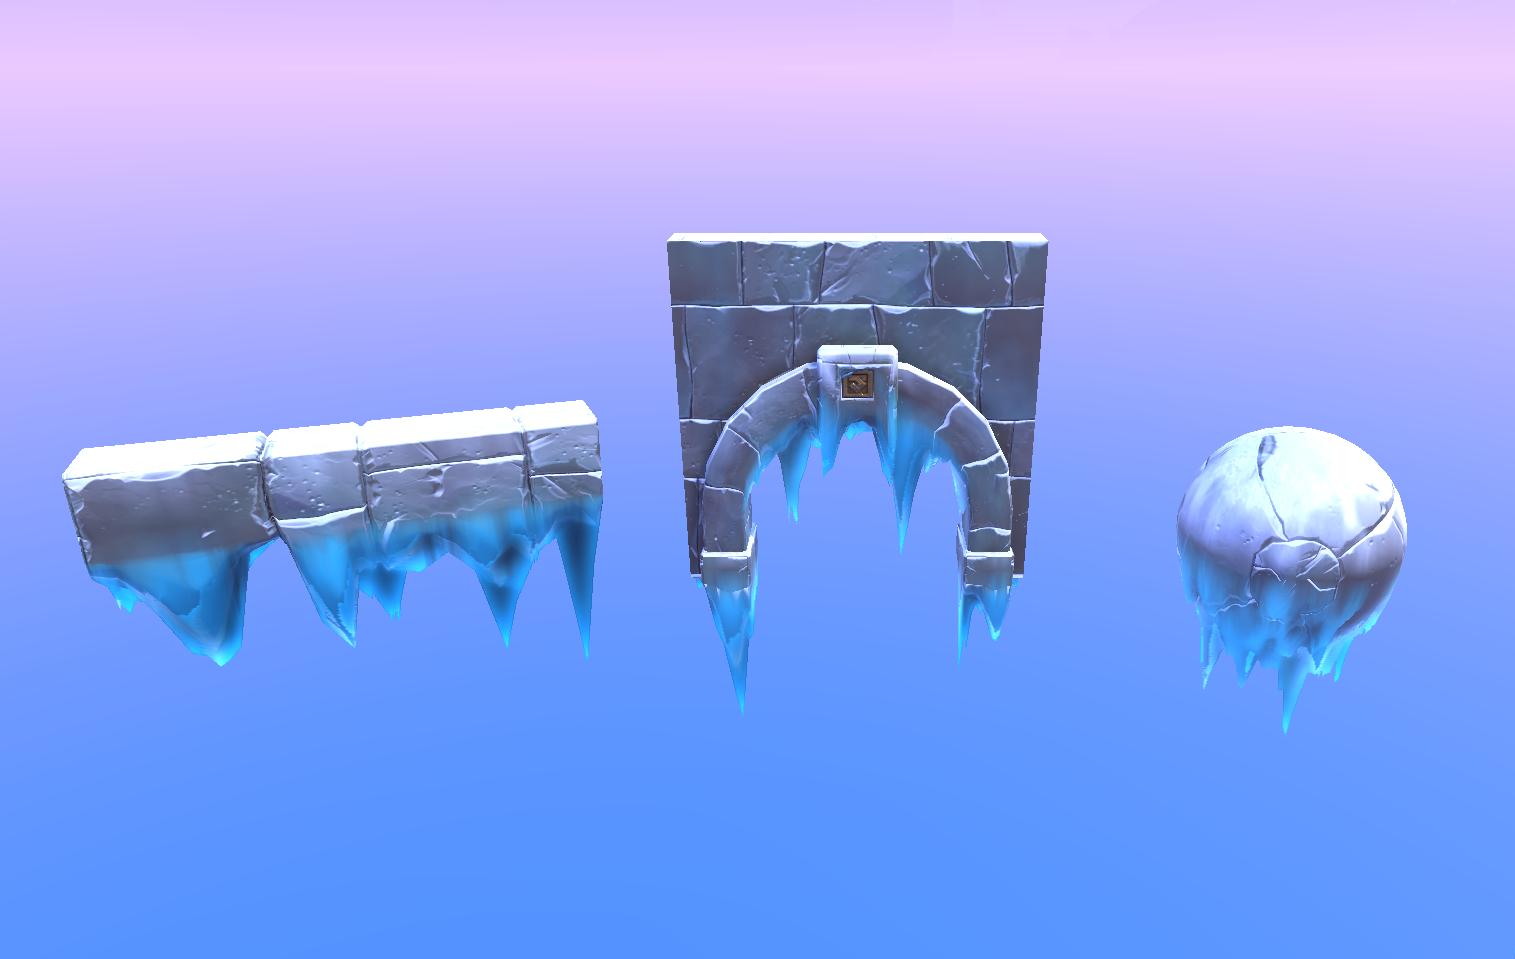 Unity 5 shaders